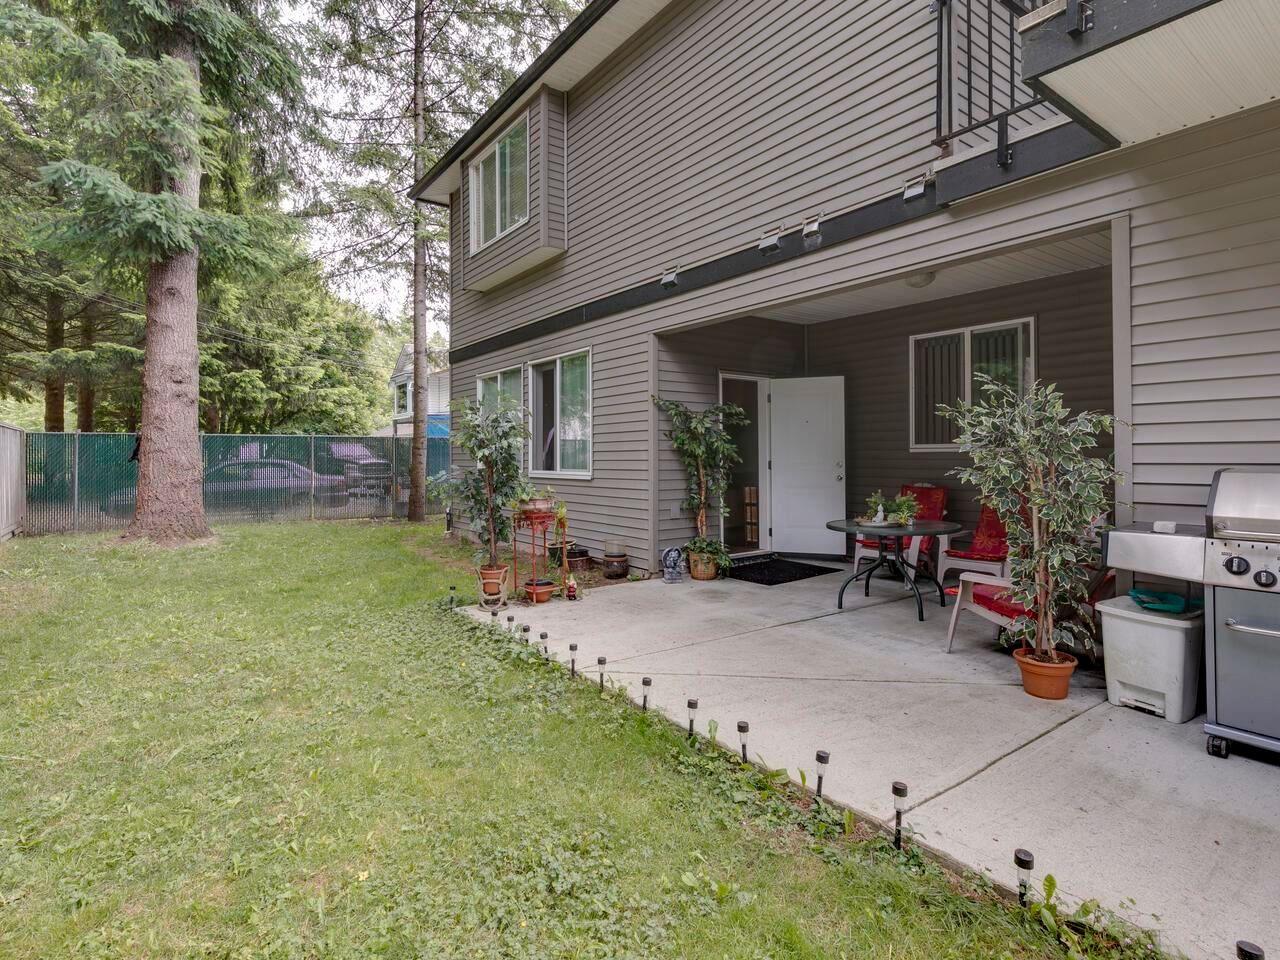 "Photo 32: Photos: 22845 126B Avenue in Maple Ridge: East Central House for sale in ""EAST CENTRAL MAPLE RIDGE"" : MLS®# R2594638"